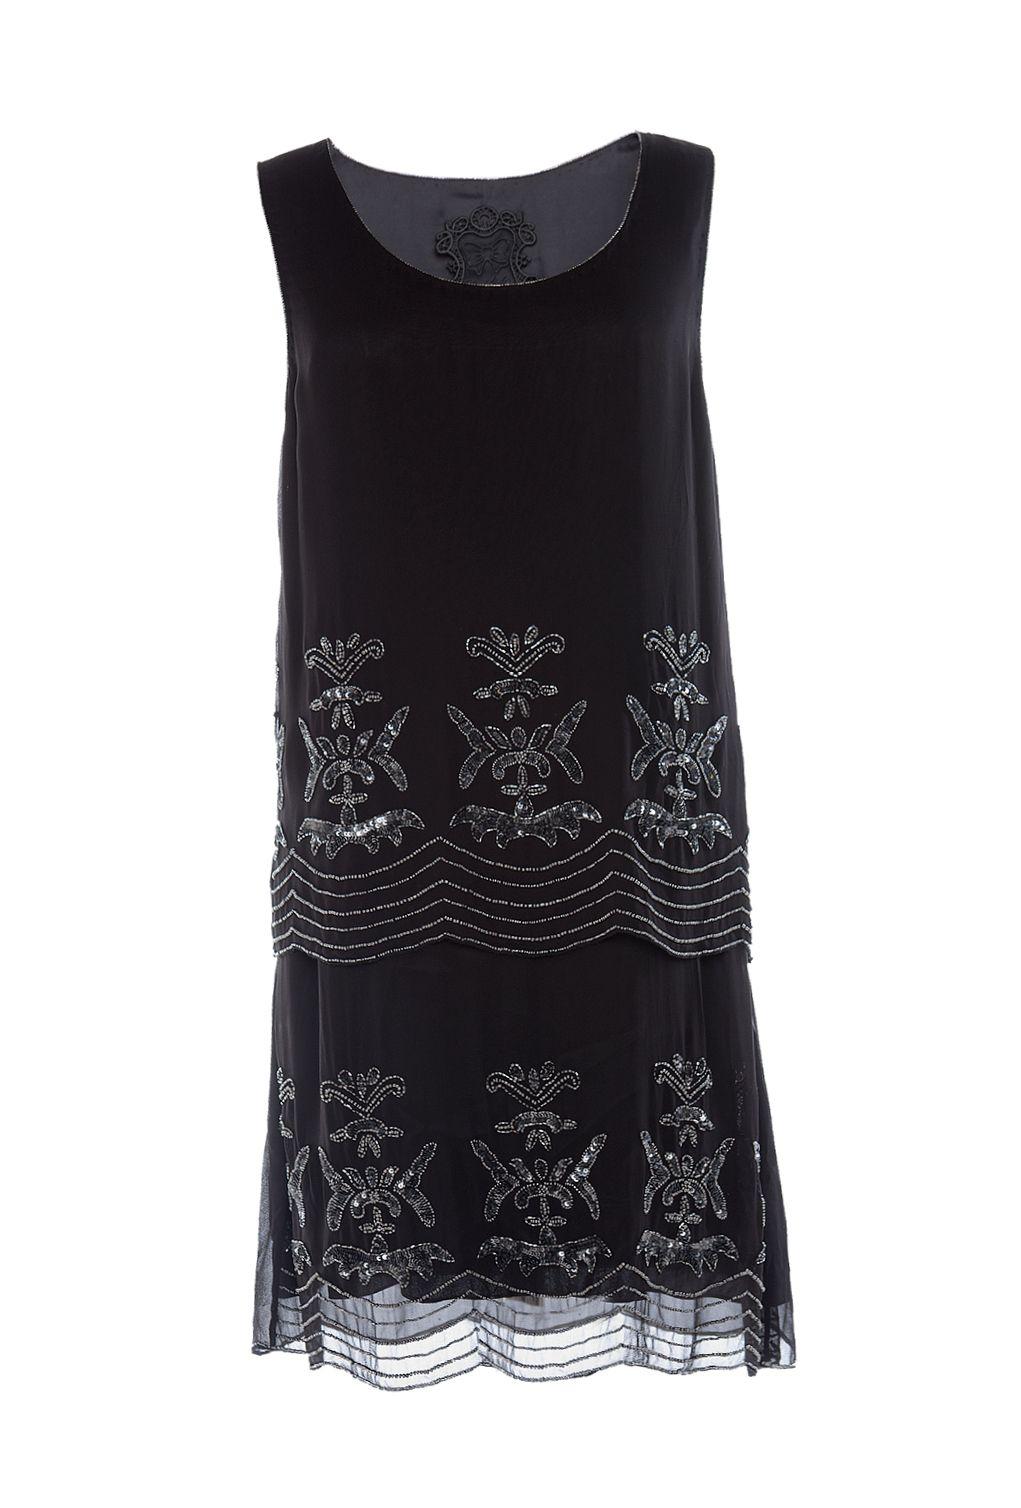 Embroidered dress shopxdesigneneveningdresses